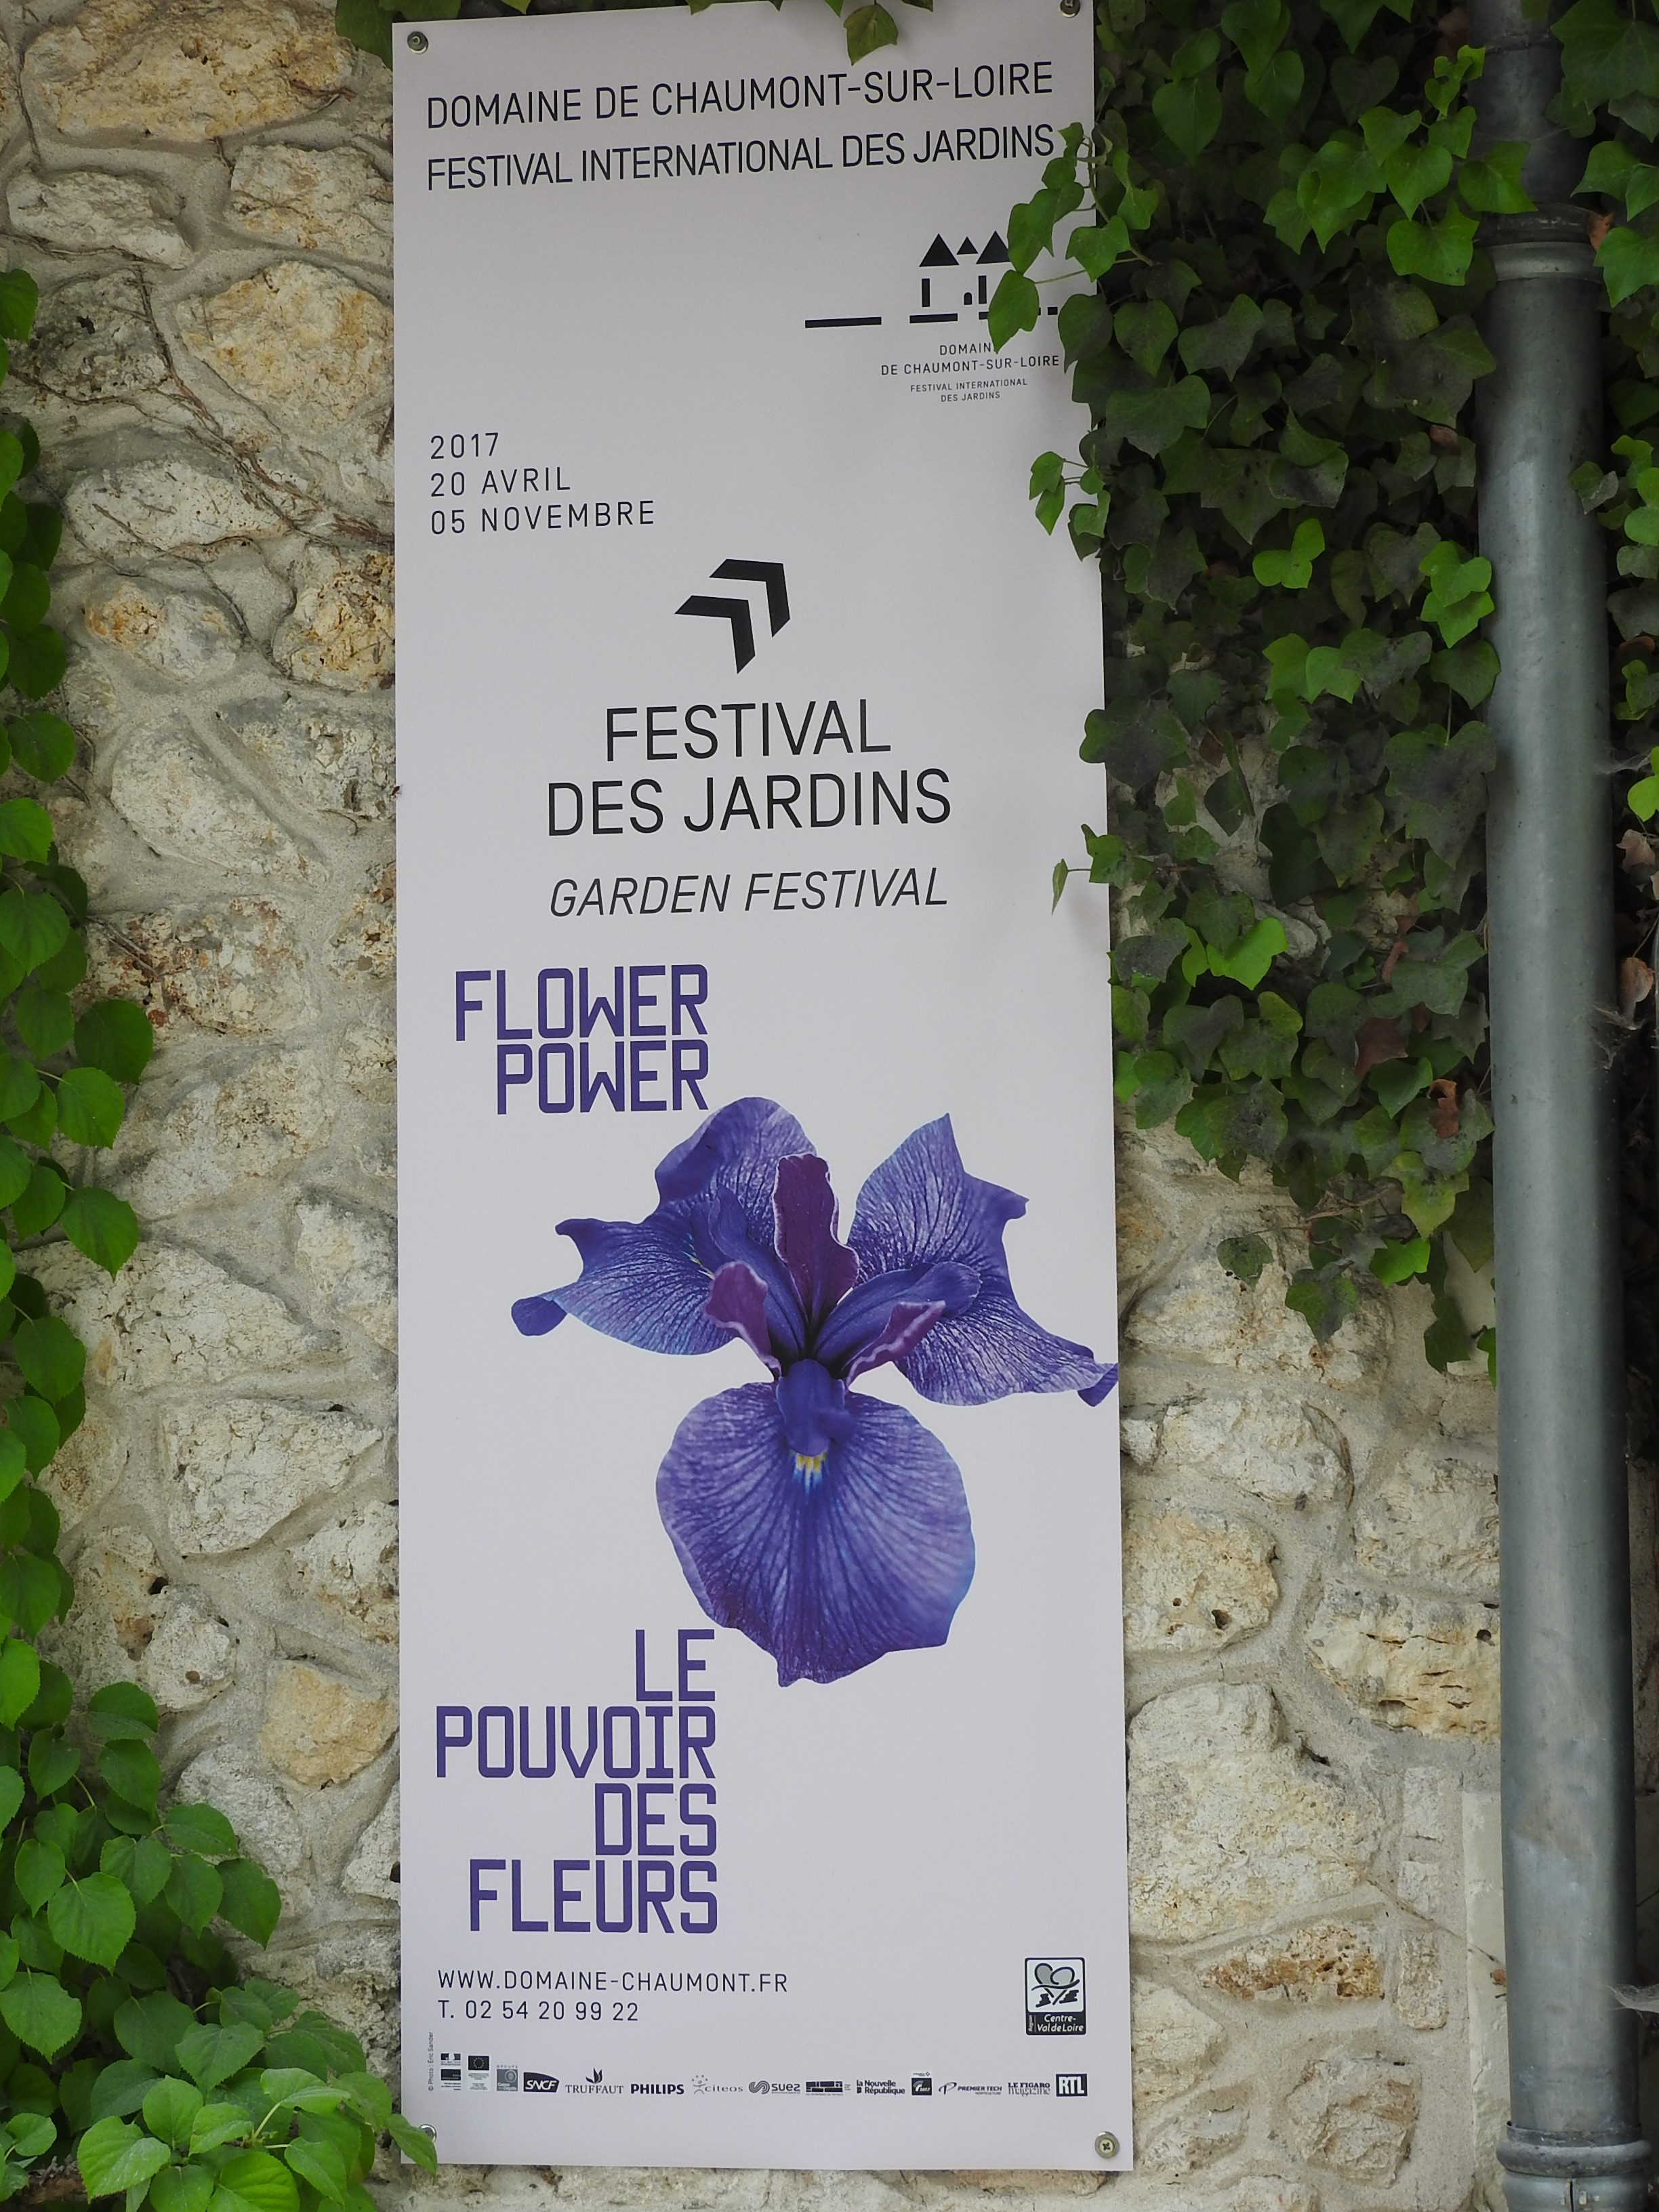 Journ e festival international des jardins chaumont sur - Festival international des jardins de chaumont ...